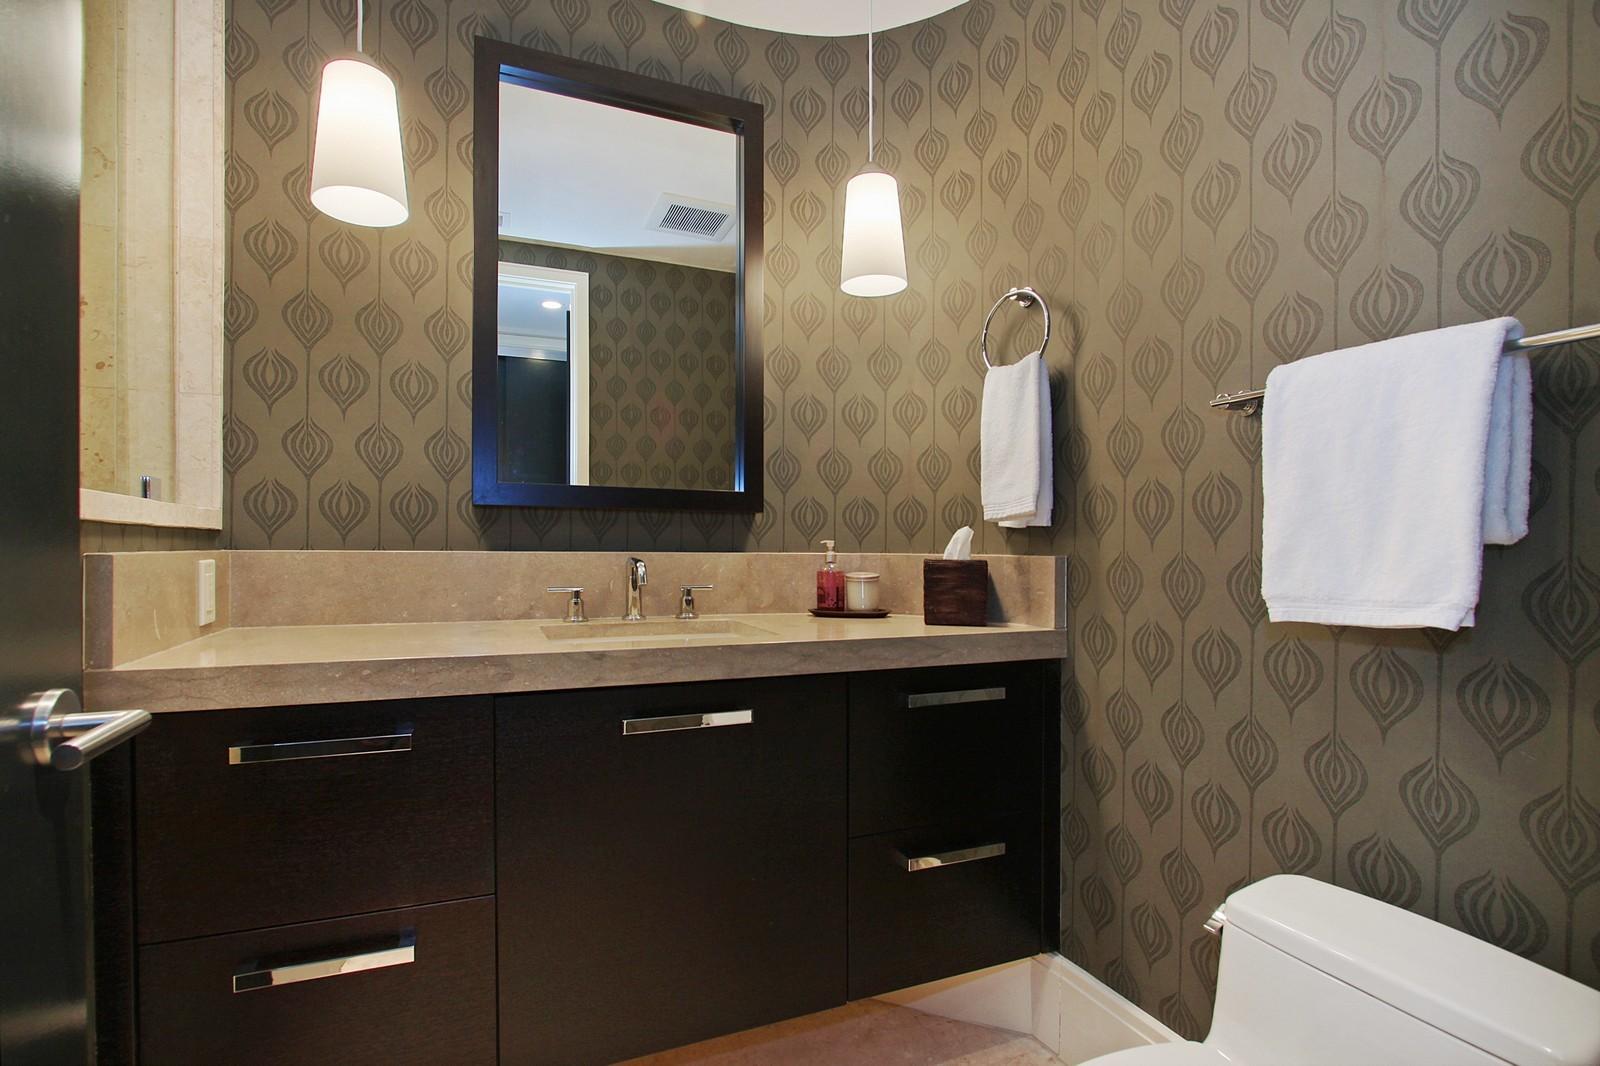 Real Estate Photography - 2001 SE Sailfish Point Blvd, Unit 318, Stuart, FL, 34996 - Bathroom